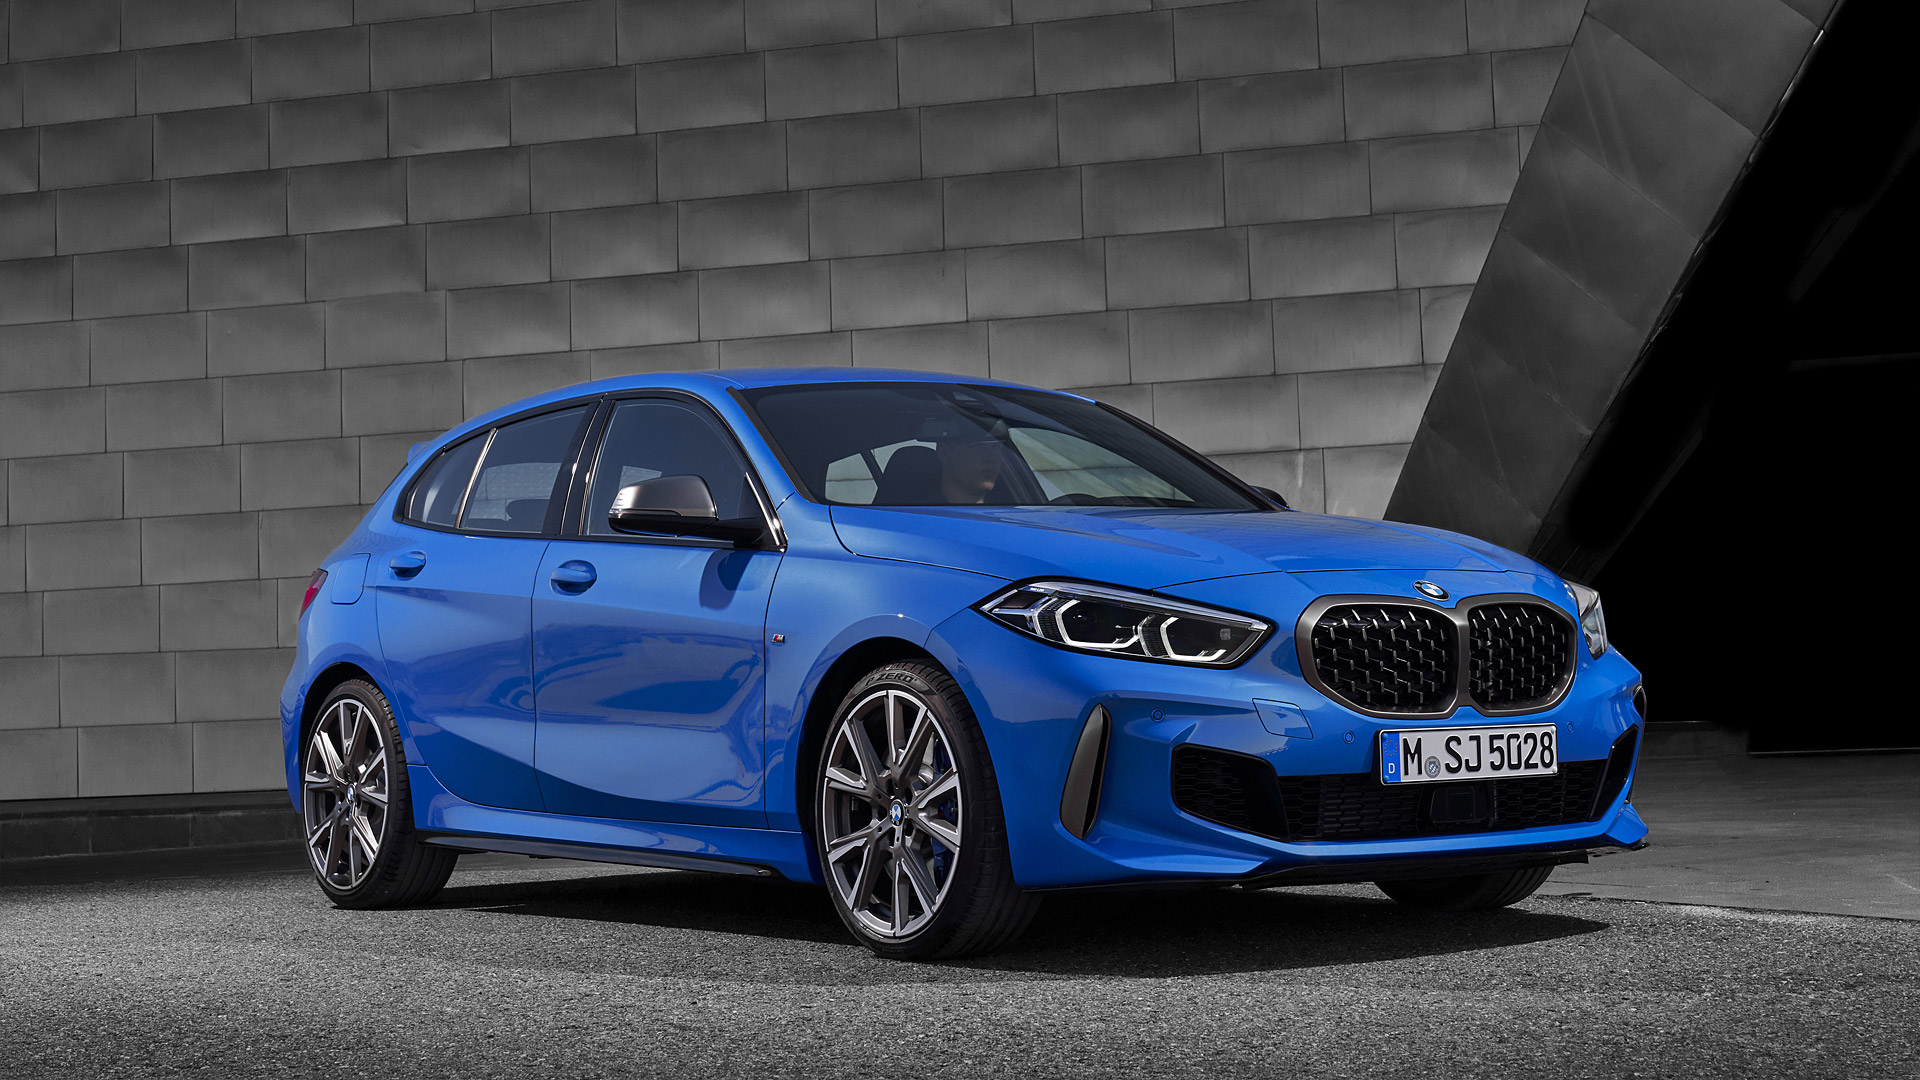 2020 BMW M135i Wallpapers Specs Videos   4K HD   WSupercars 1920x1080